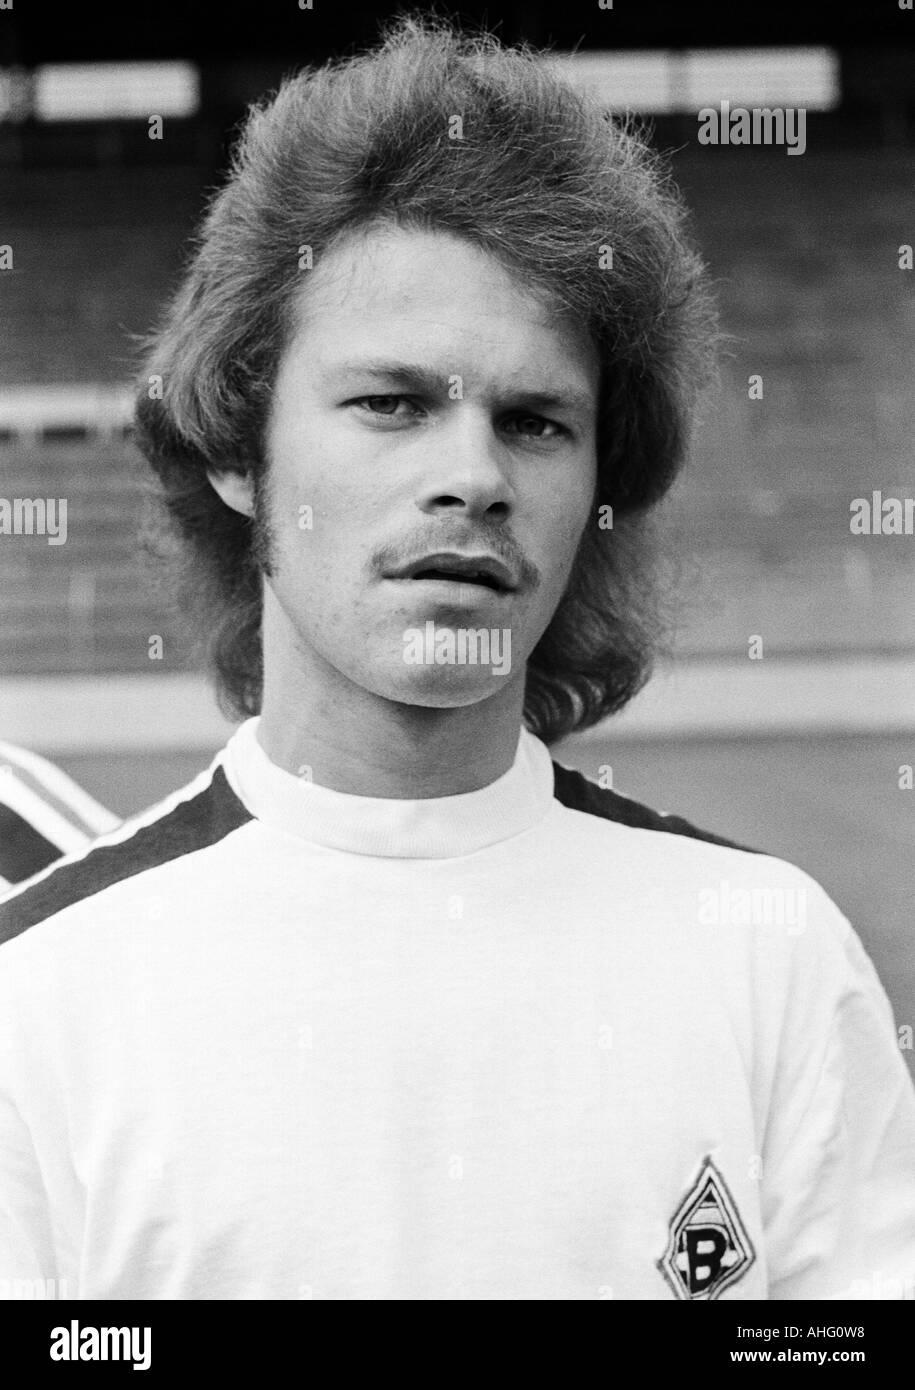 football, Bundesliga, Borussia Moenchengladbach, presentation of the team for the new saison 1975/1976, press photo Stock Photo